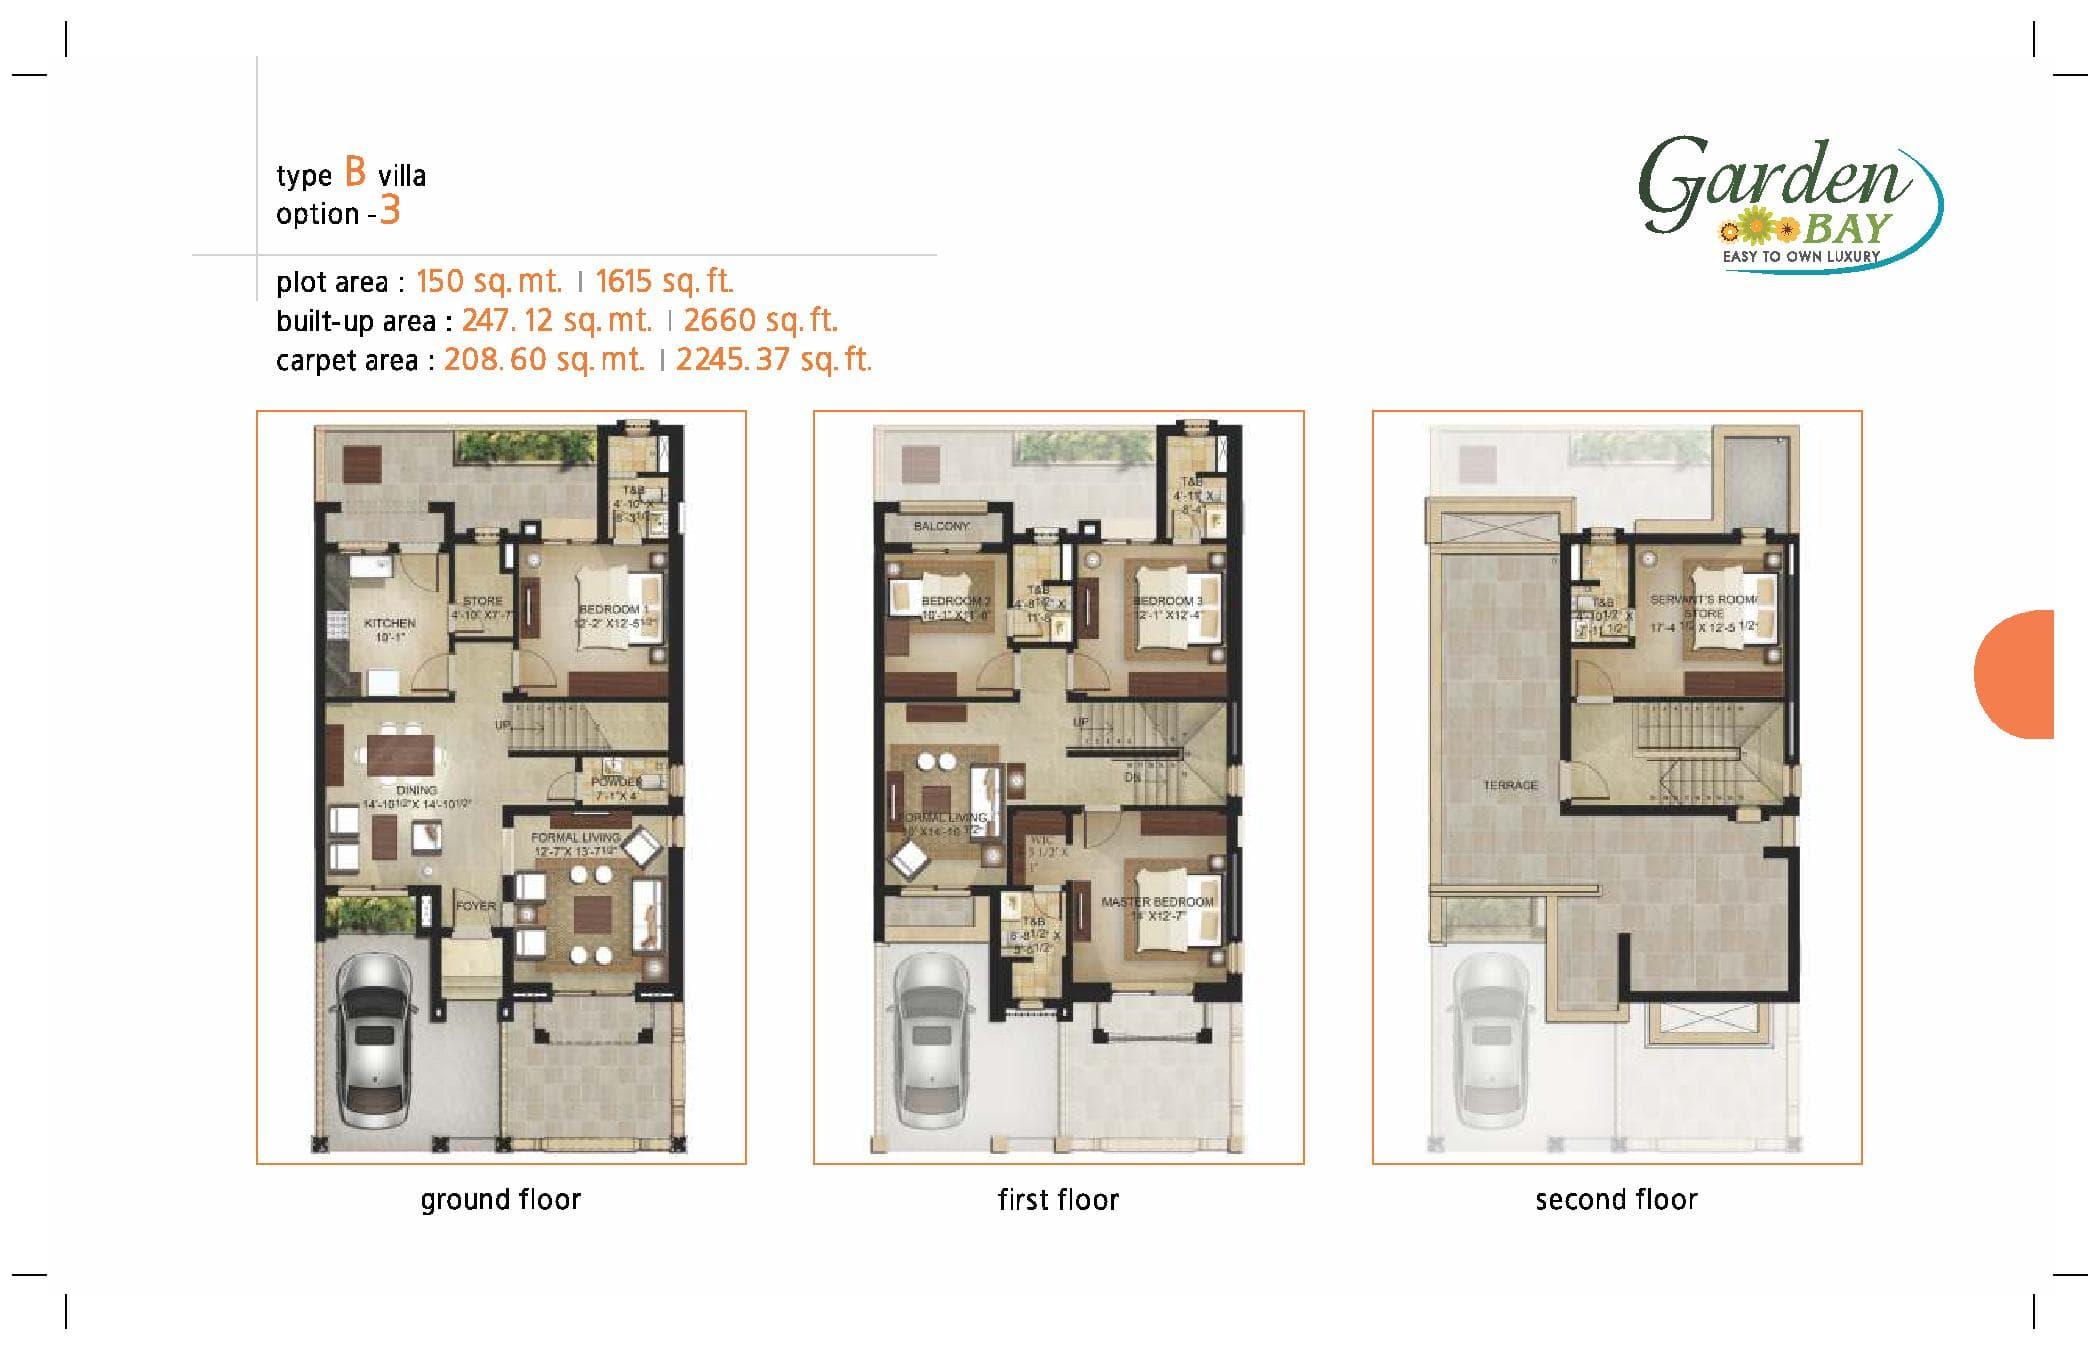 Garden Bay Type B Villa